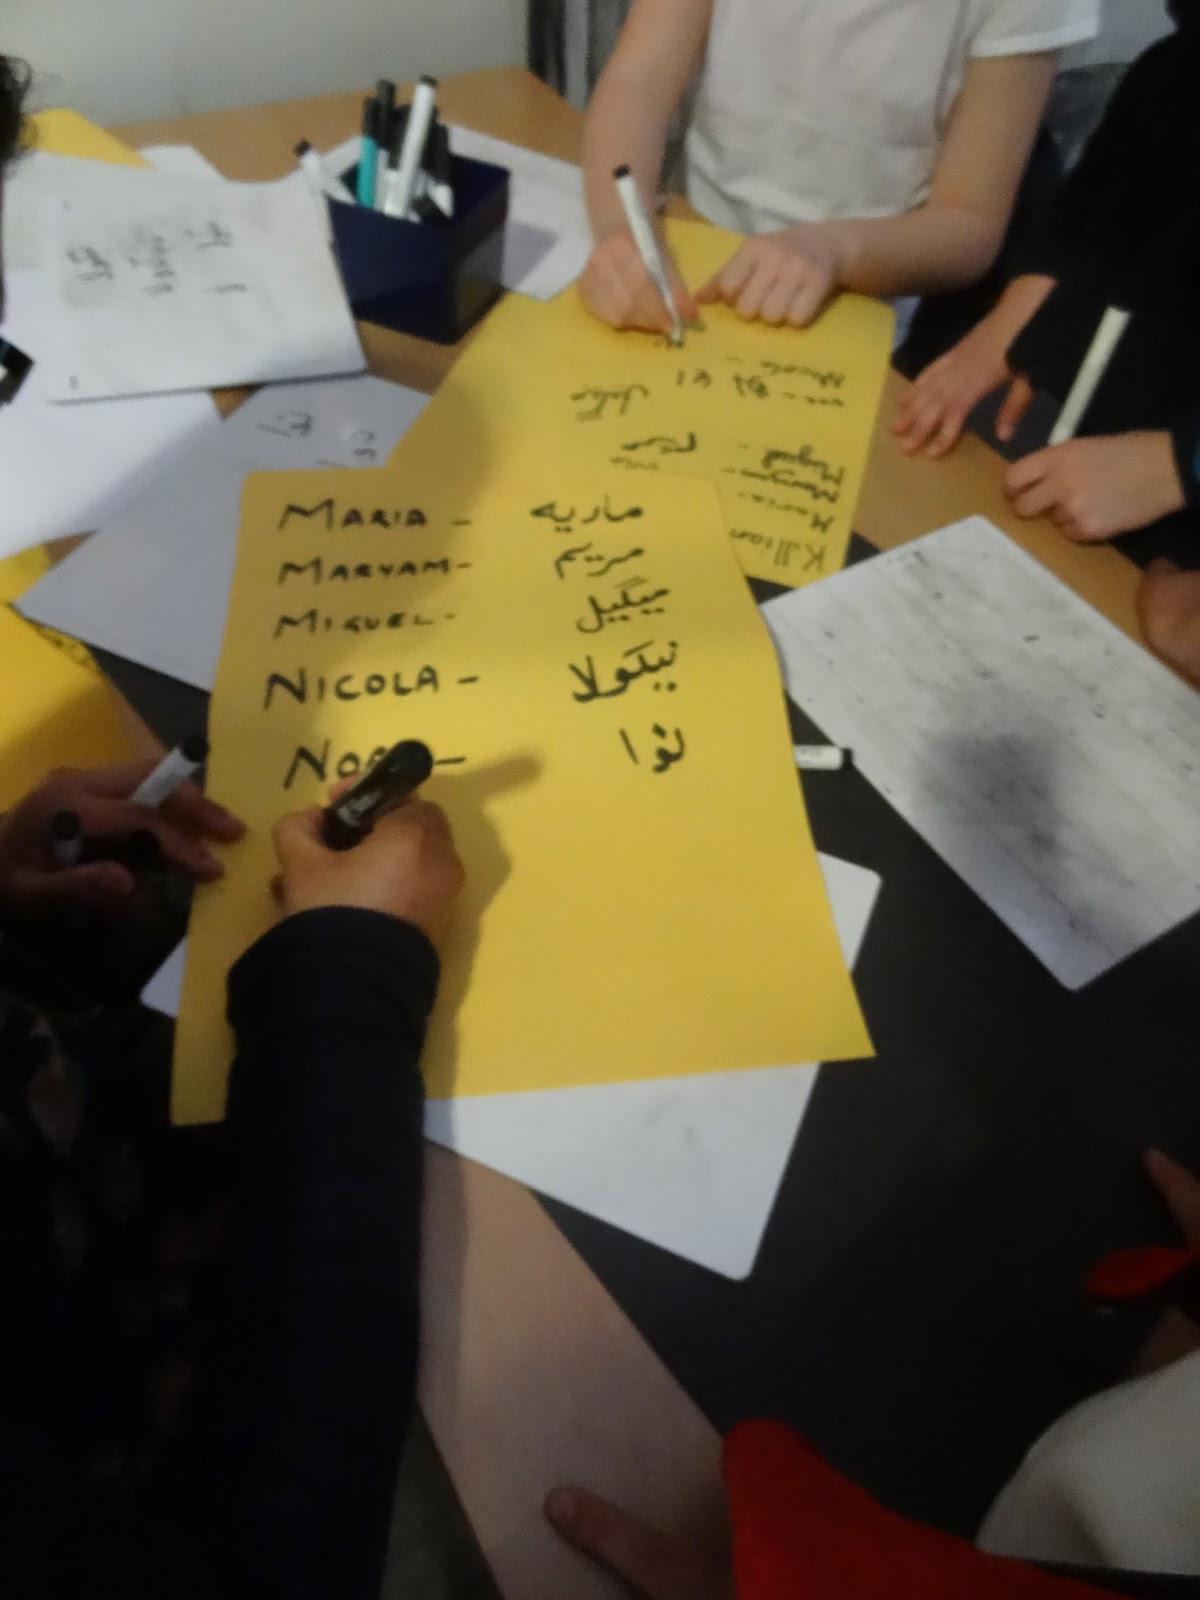 y4 at ist writing our names in urdu - Periodic Table With Names In Urdu